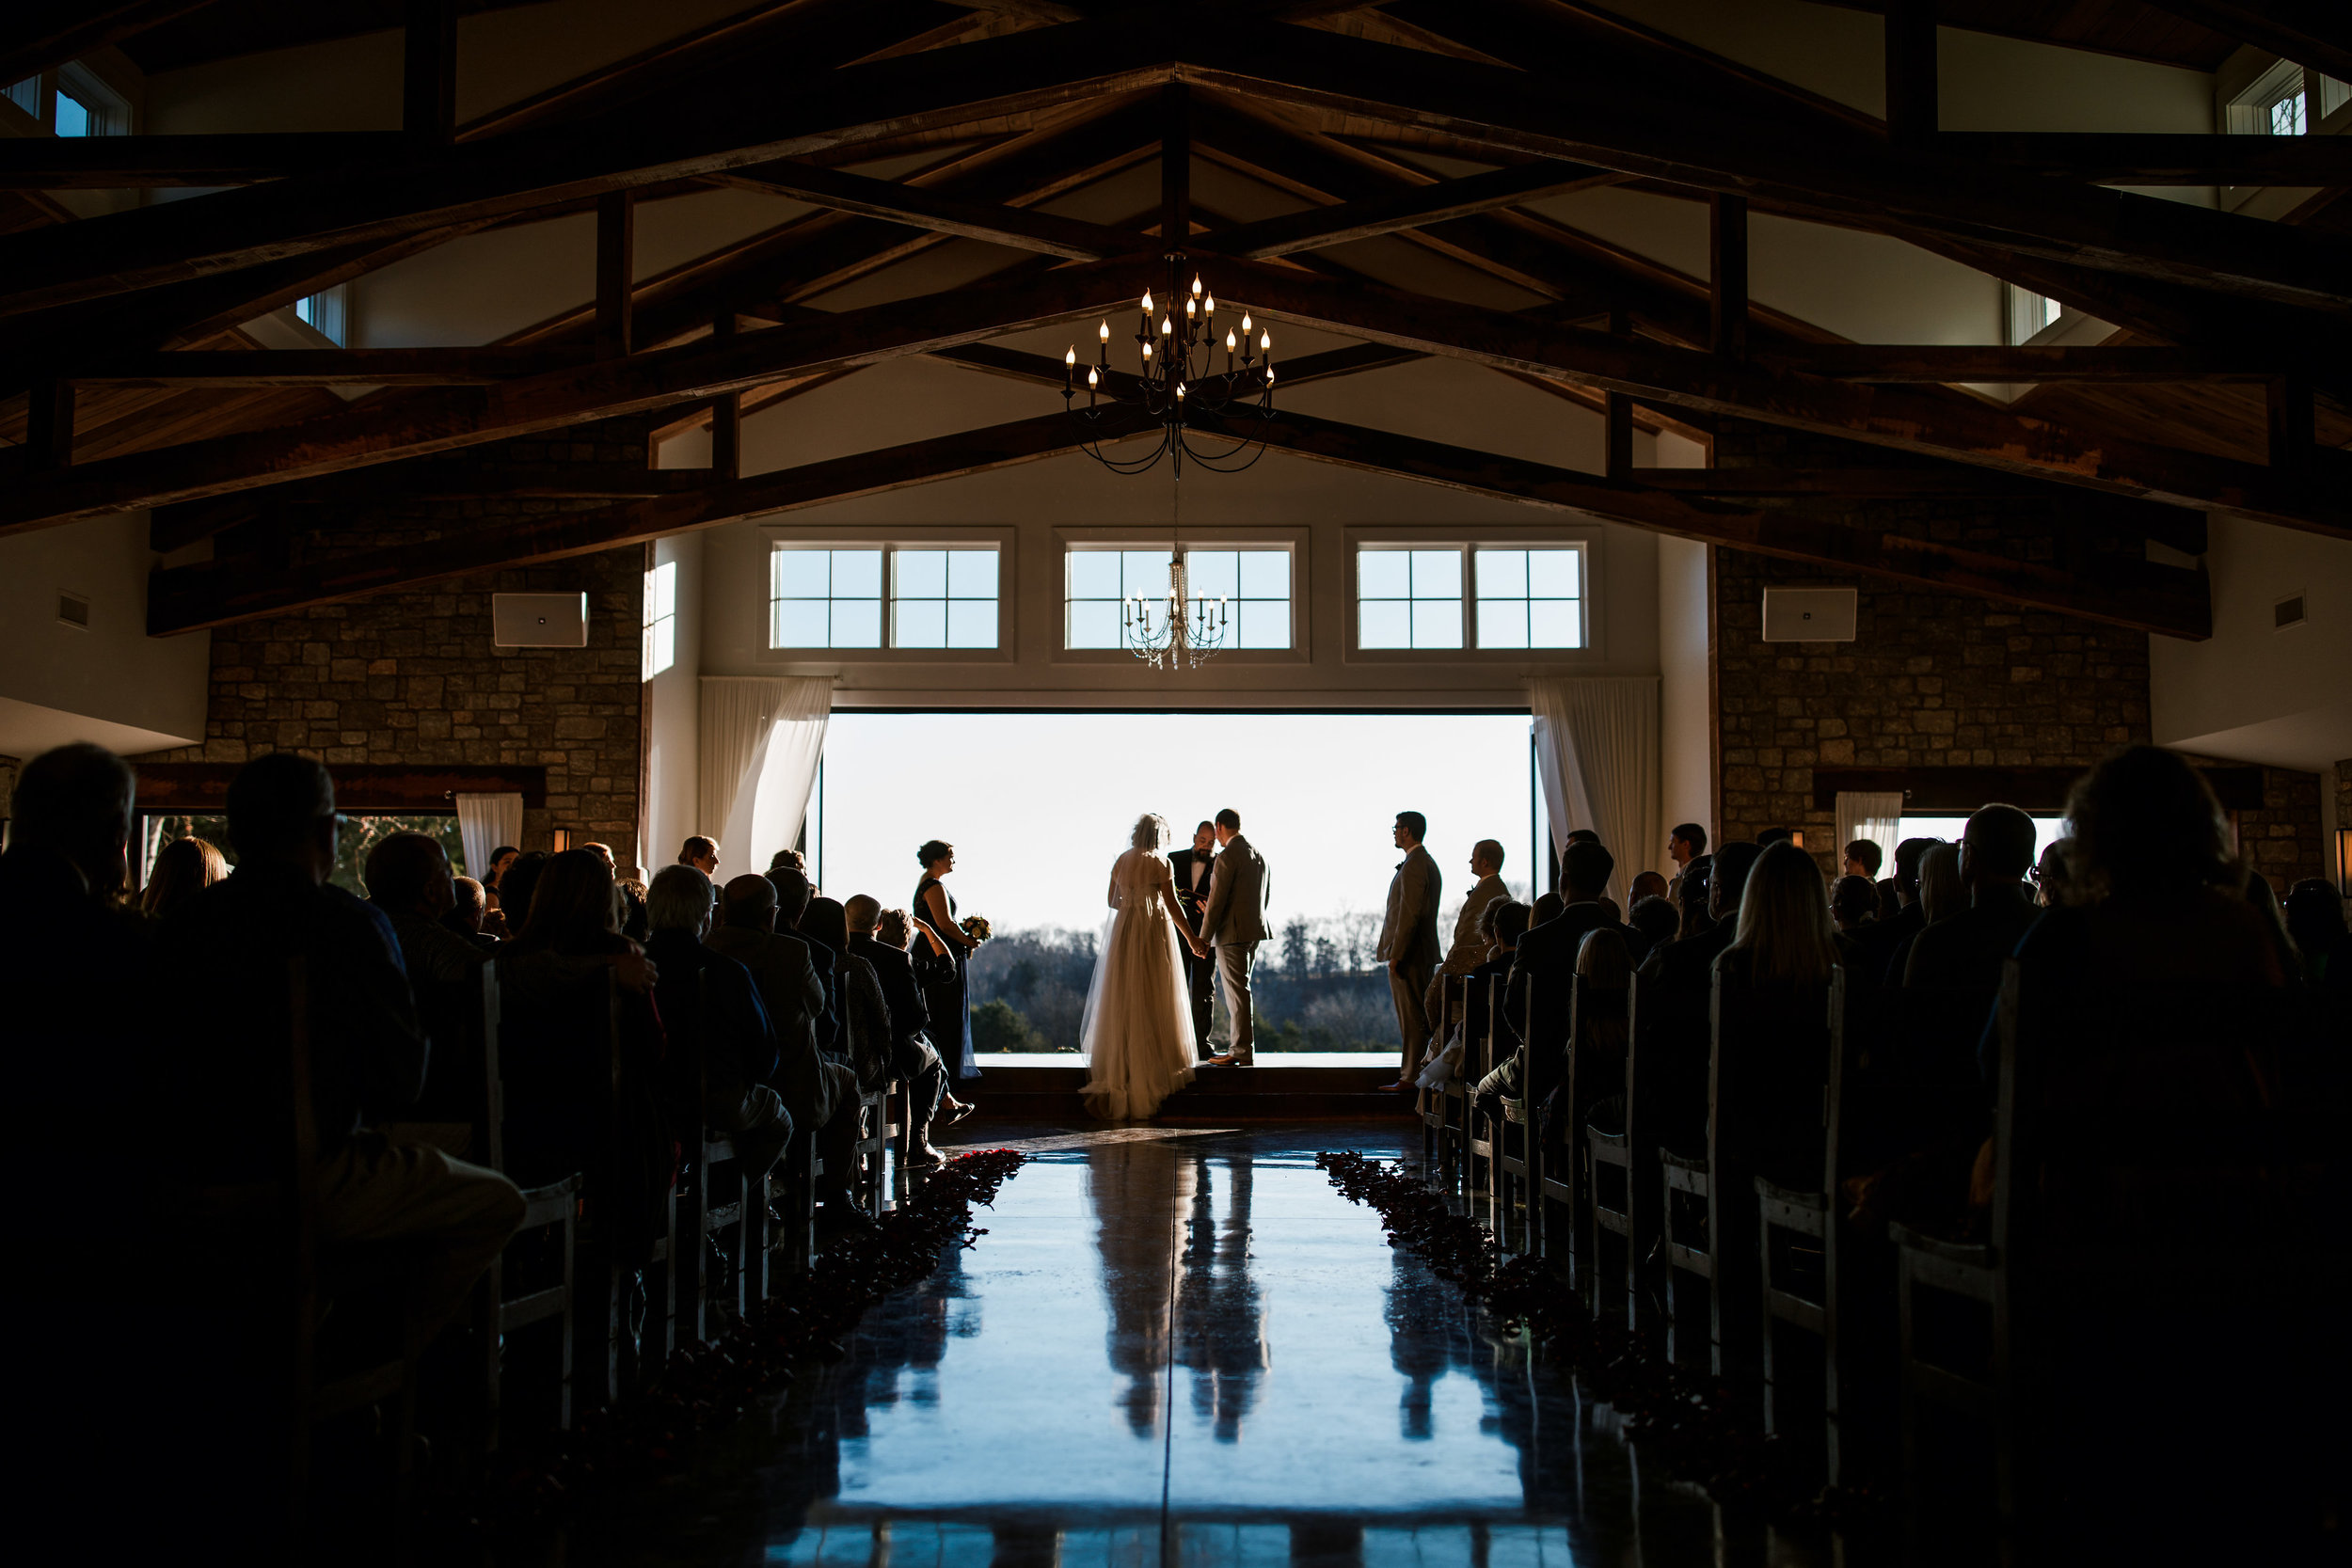 Graystone-Quarry-Wedding 48.jpg